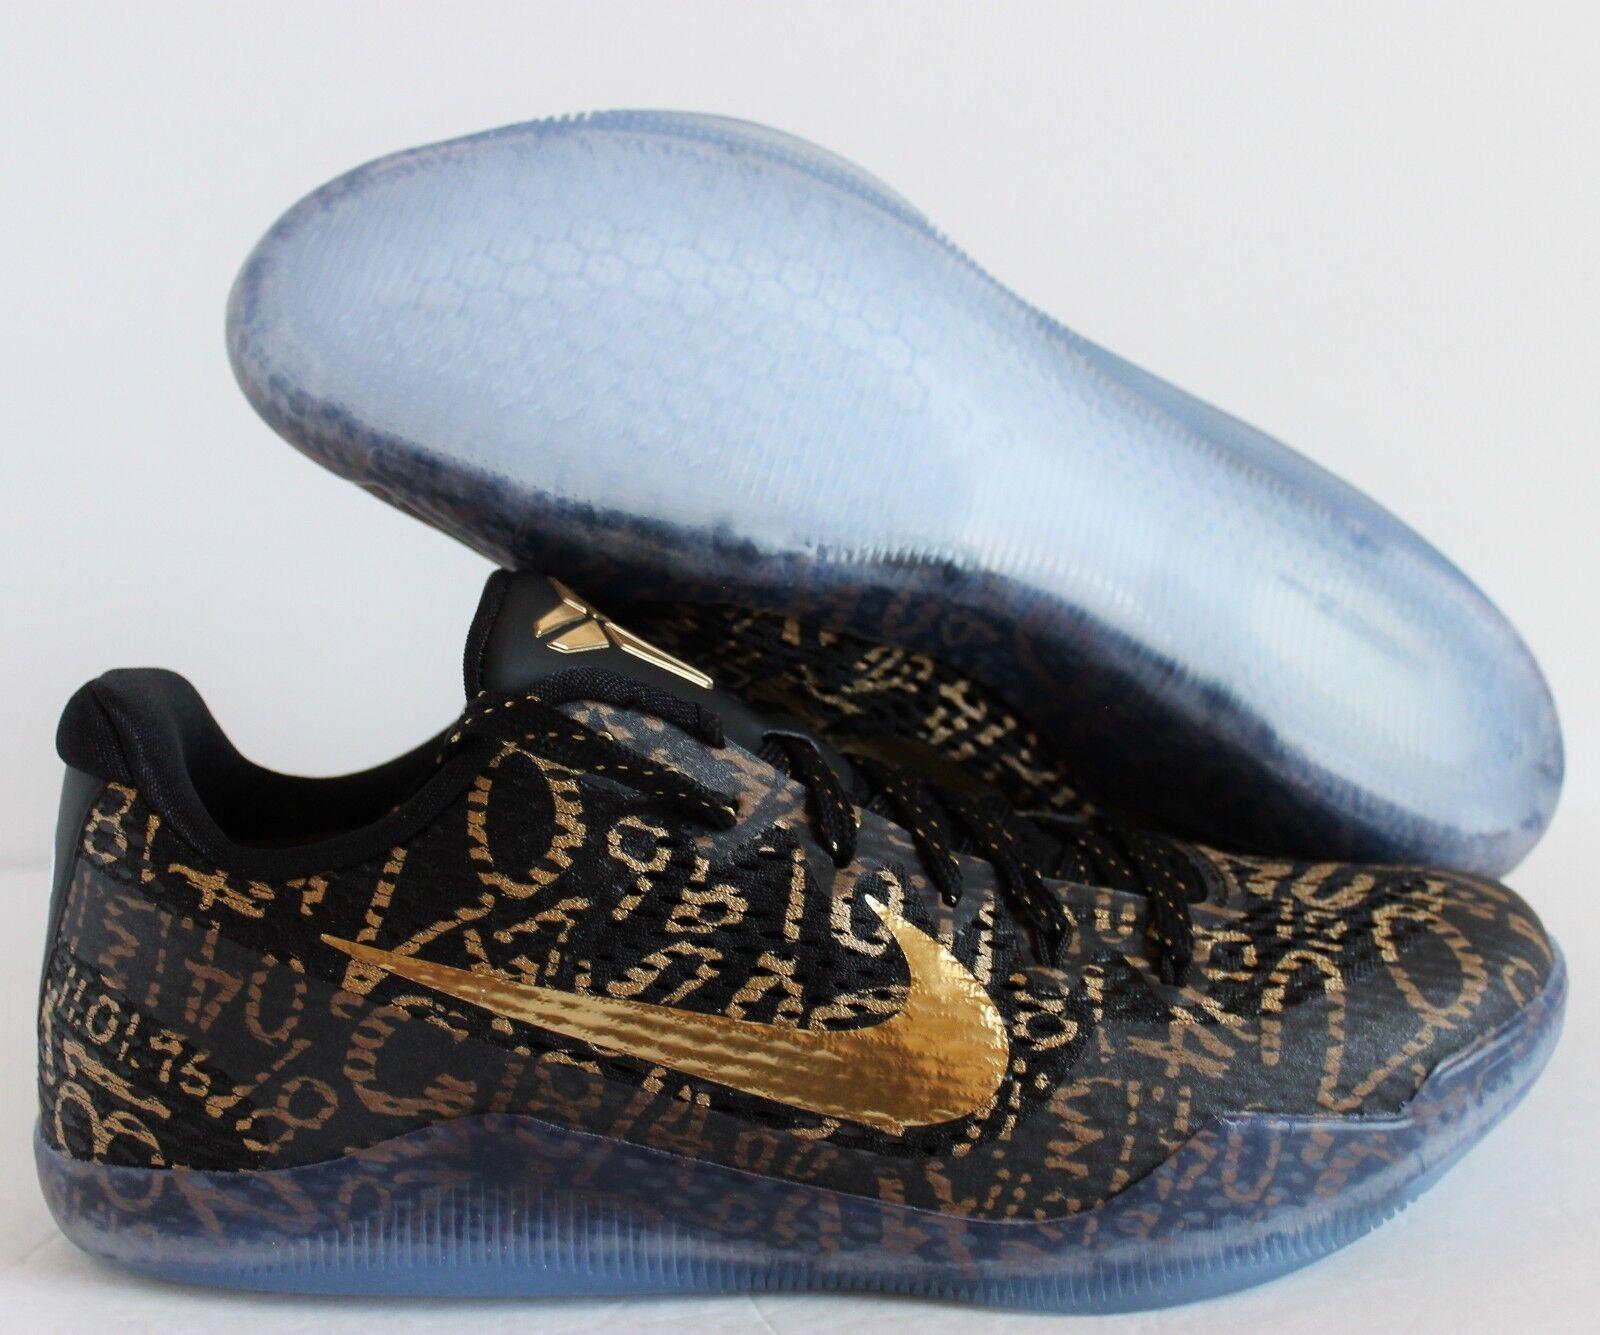 Nike kobe xi 11 id mamba giorno nero-gold sz 10 [865773-991]